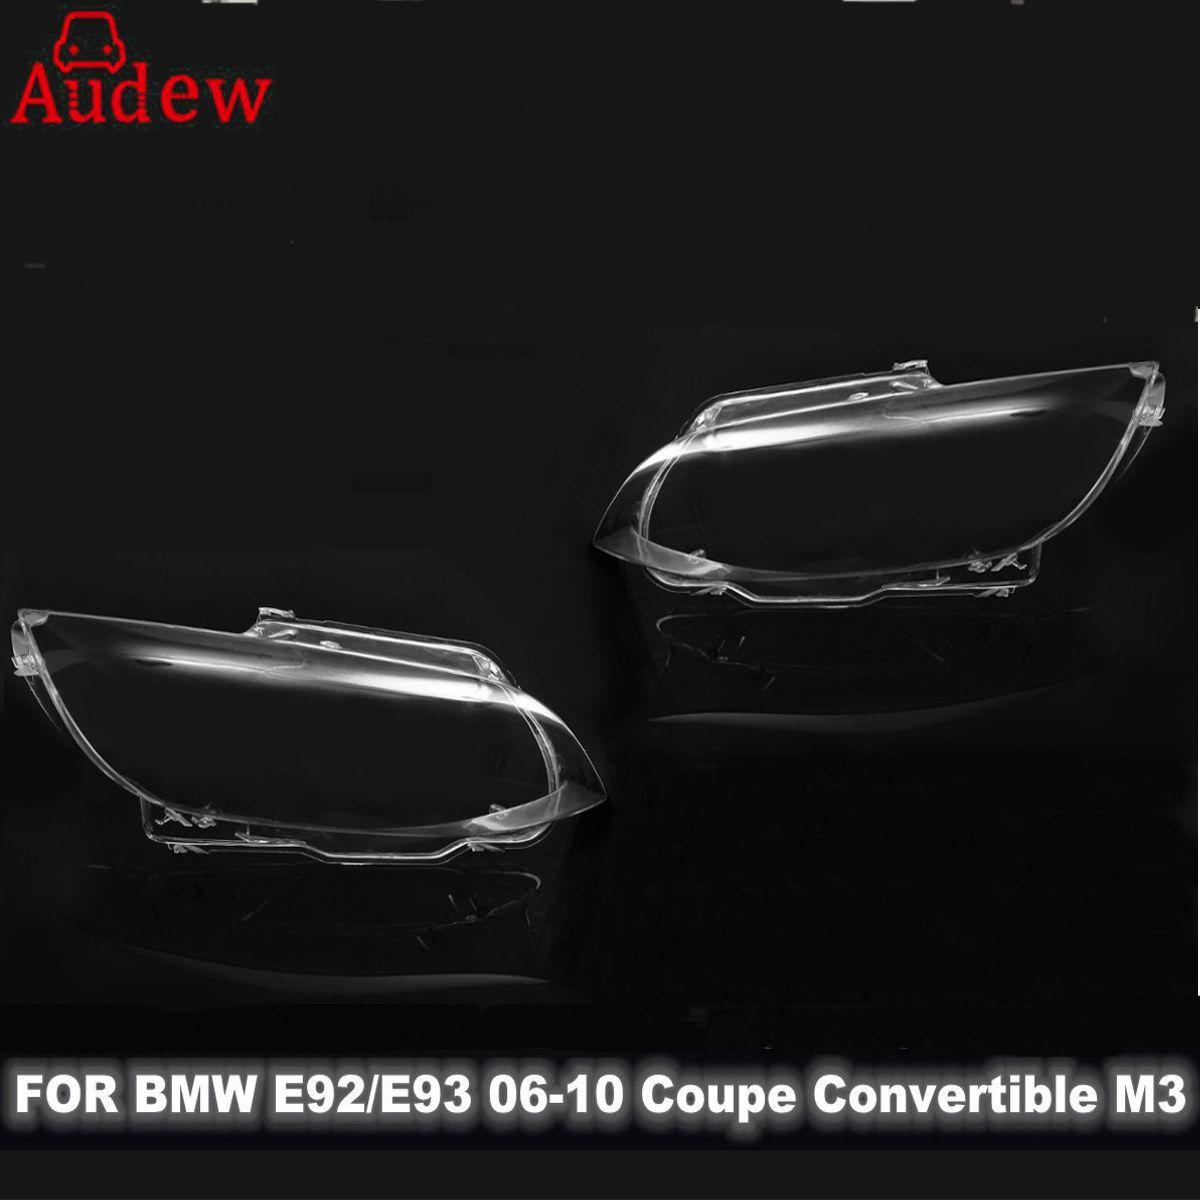 1 шт. фары автомобиля фары крышка объектива влево/вправо для BMW E92 E93 купе M3 06-10